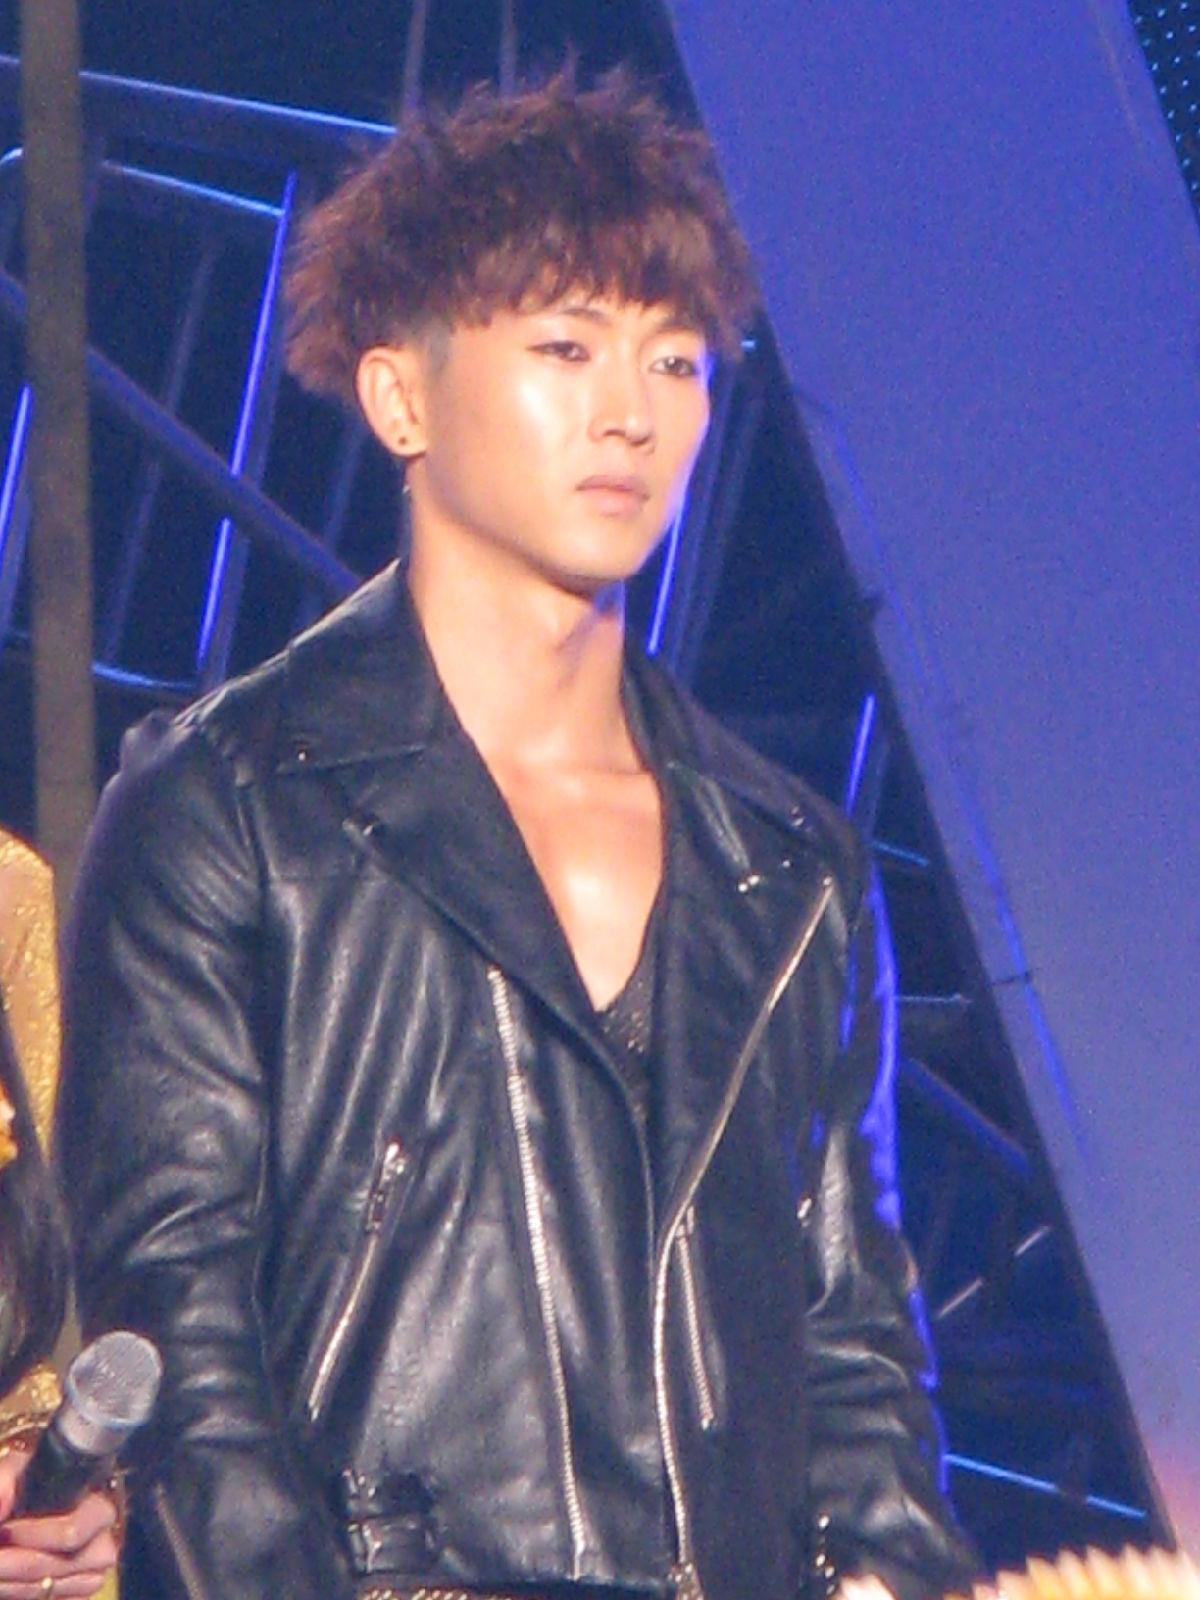 [Fotos] Woo Hyuk Music Festival -Luo Yang,China C603271037607cfea6ef3fc3